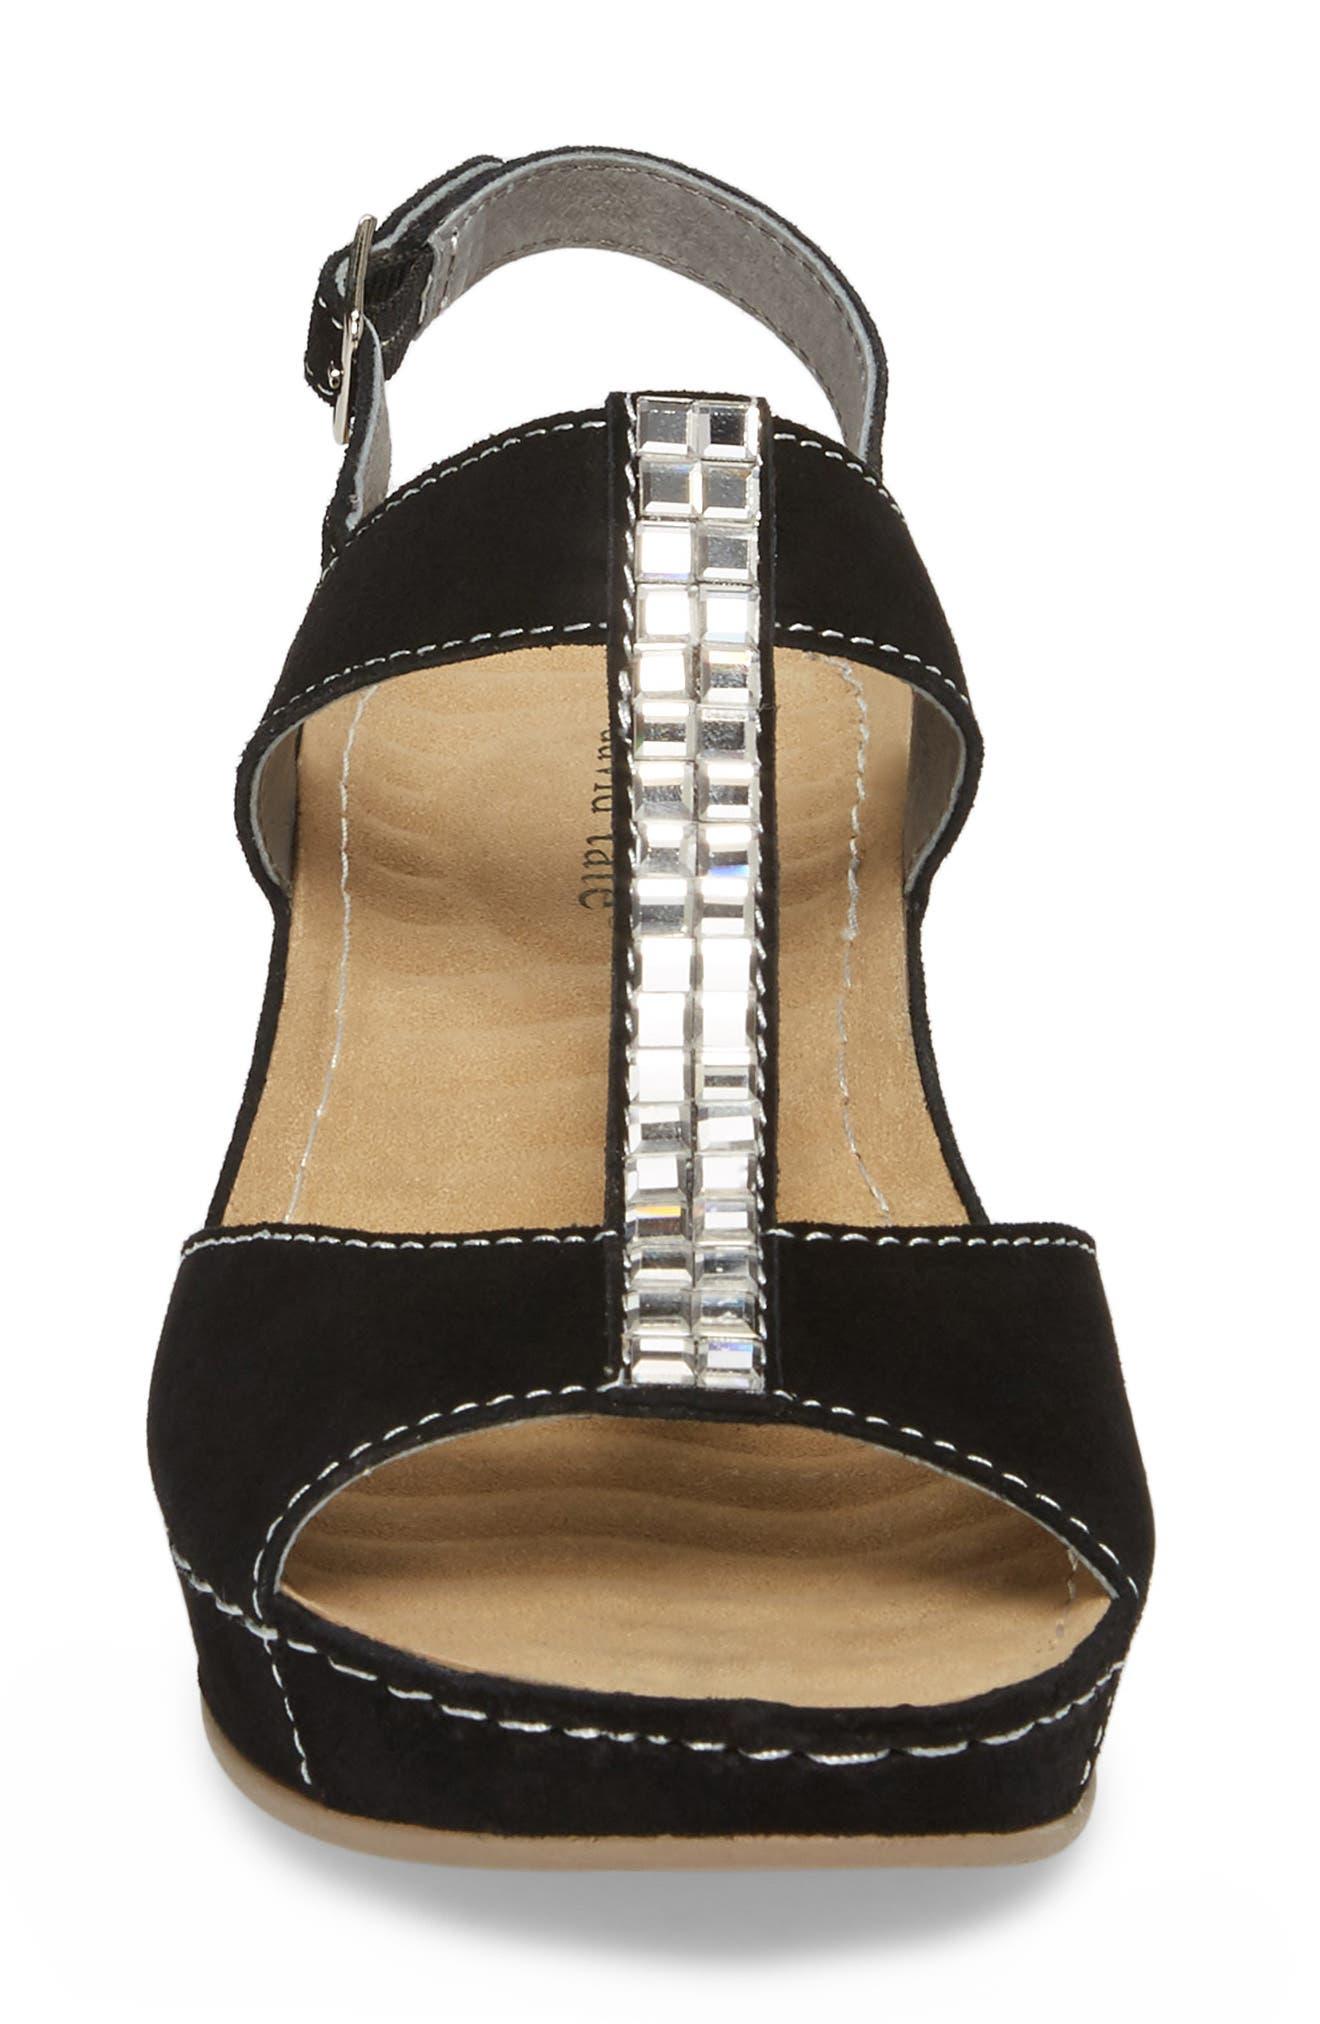 Bubbly Embellished T-Strap Wedge Sandal,                             Alternate thumbnail 4, color,                             BLACK SUEDE